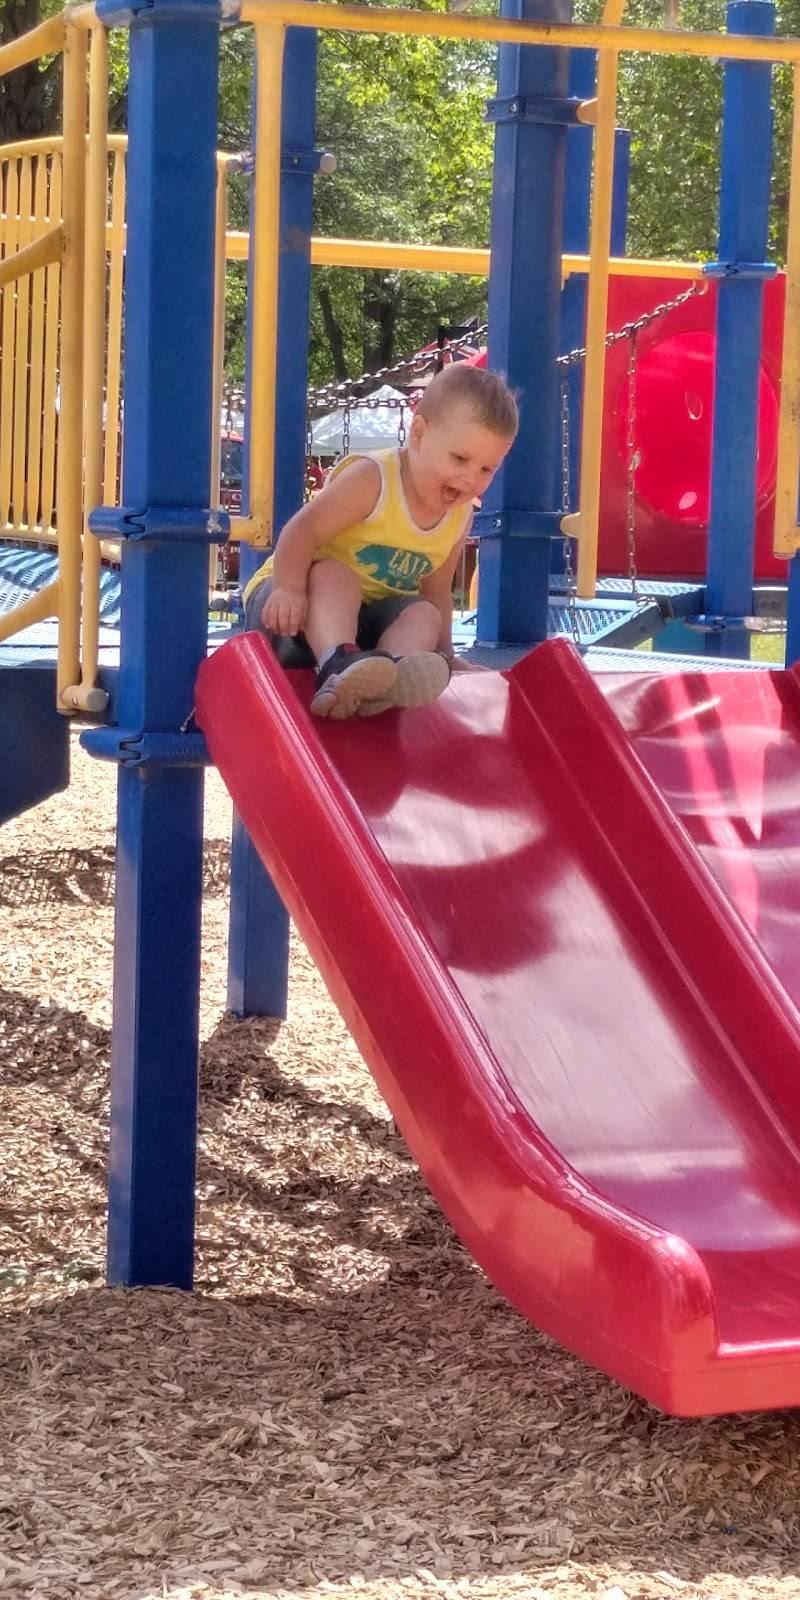 Center Line Parks & Recreation - park  | Photo 4 of 10 | Address: 25355 Lawrence Ave, Center Line, MI 48015, USA | Phone: (586) 757-1610